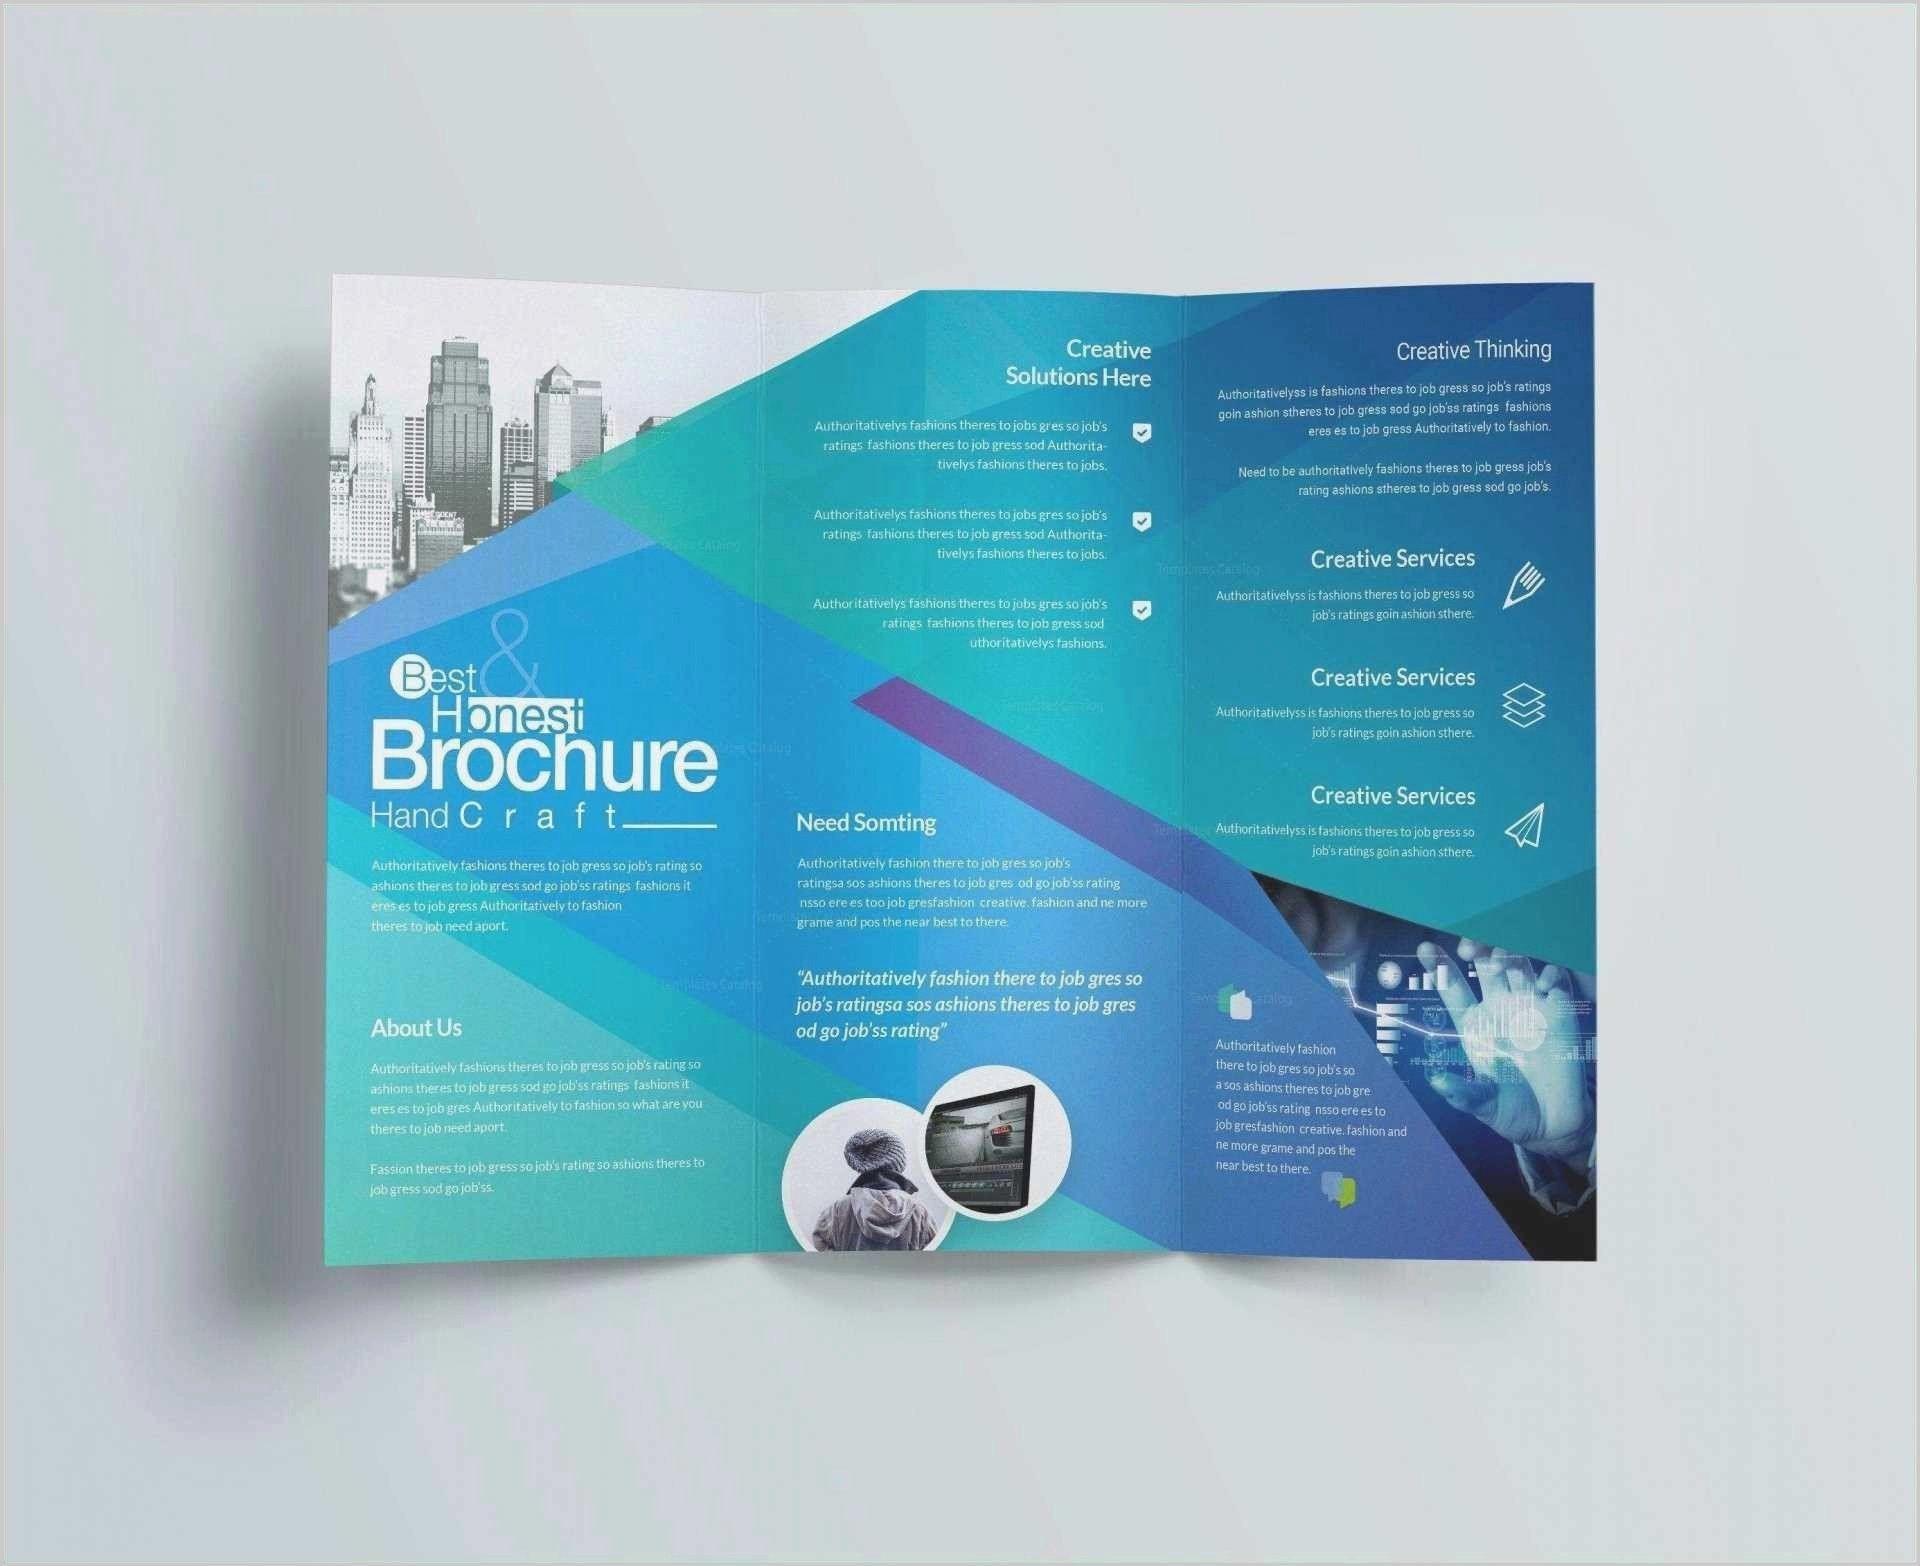 005 Impressive Microsoft Publisher Newsletter Template Photo  School Free Download1920